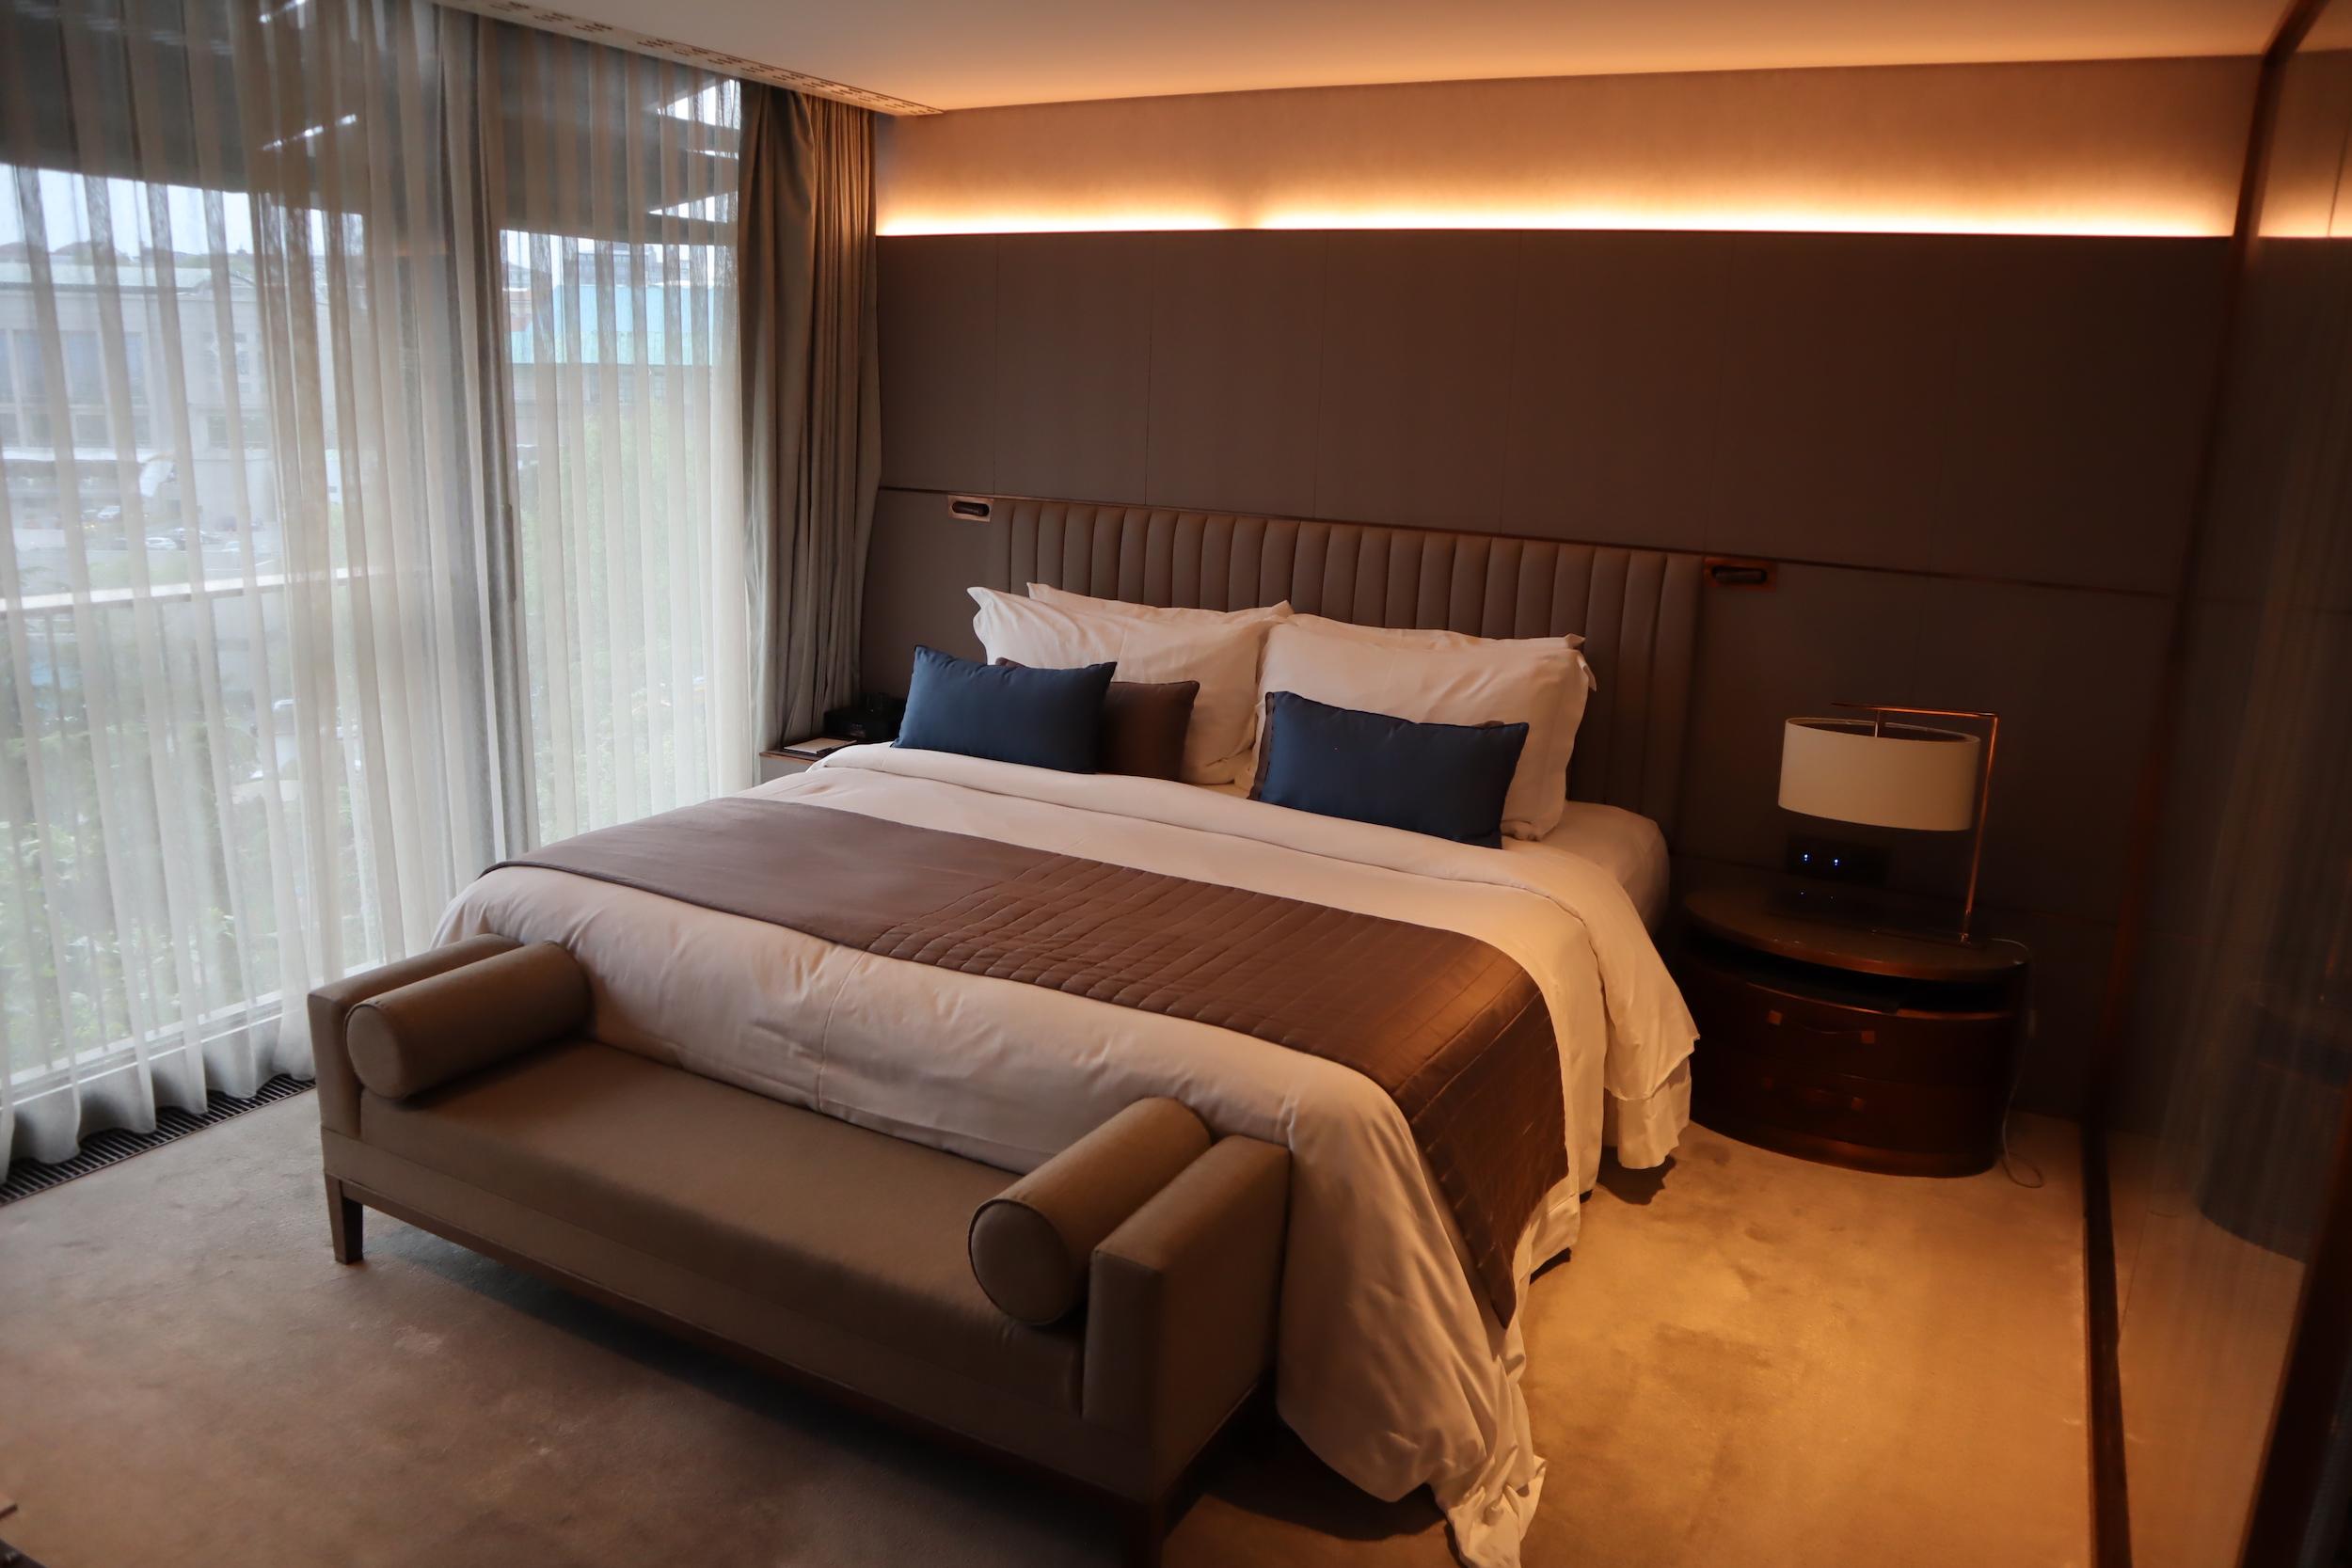 St. Regis Istanbul – St. Regis Suite bedroom